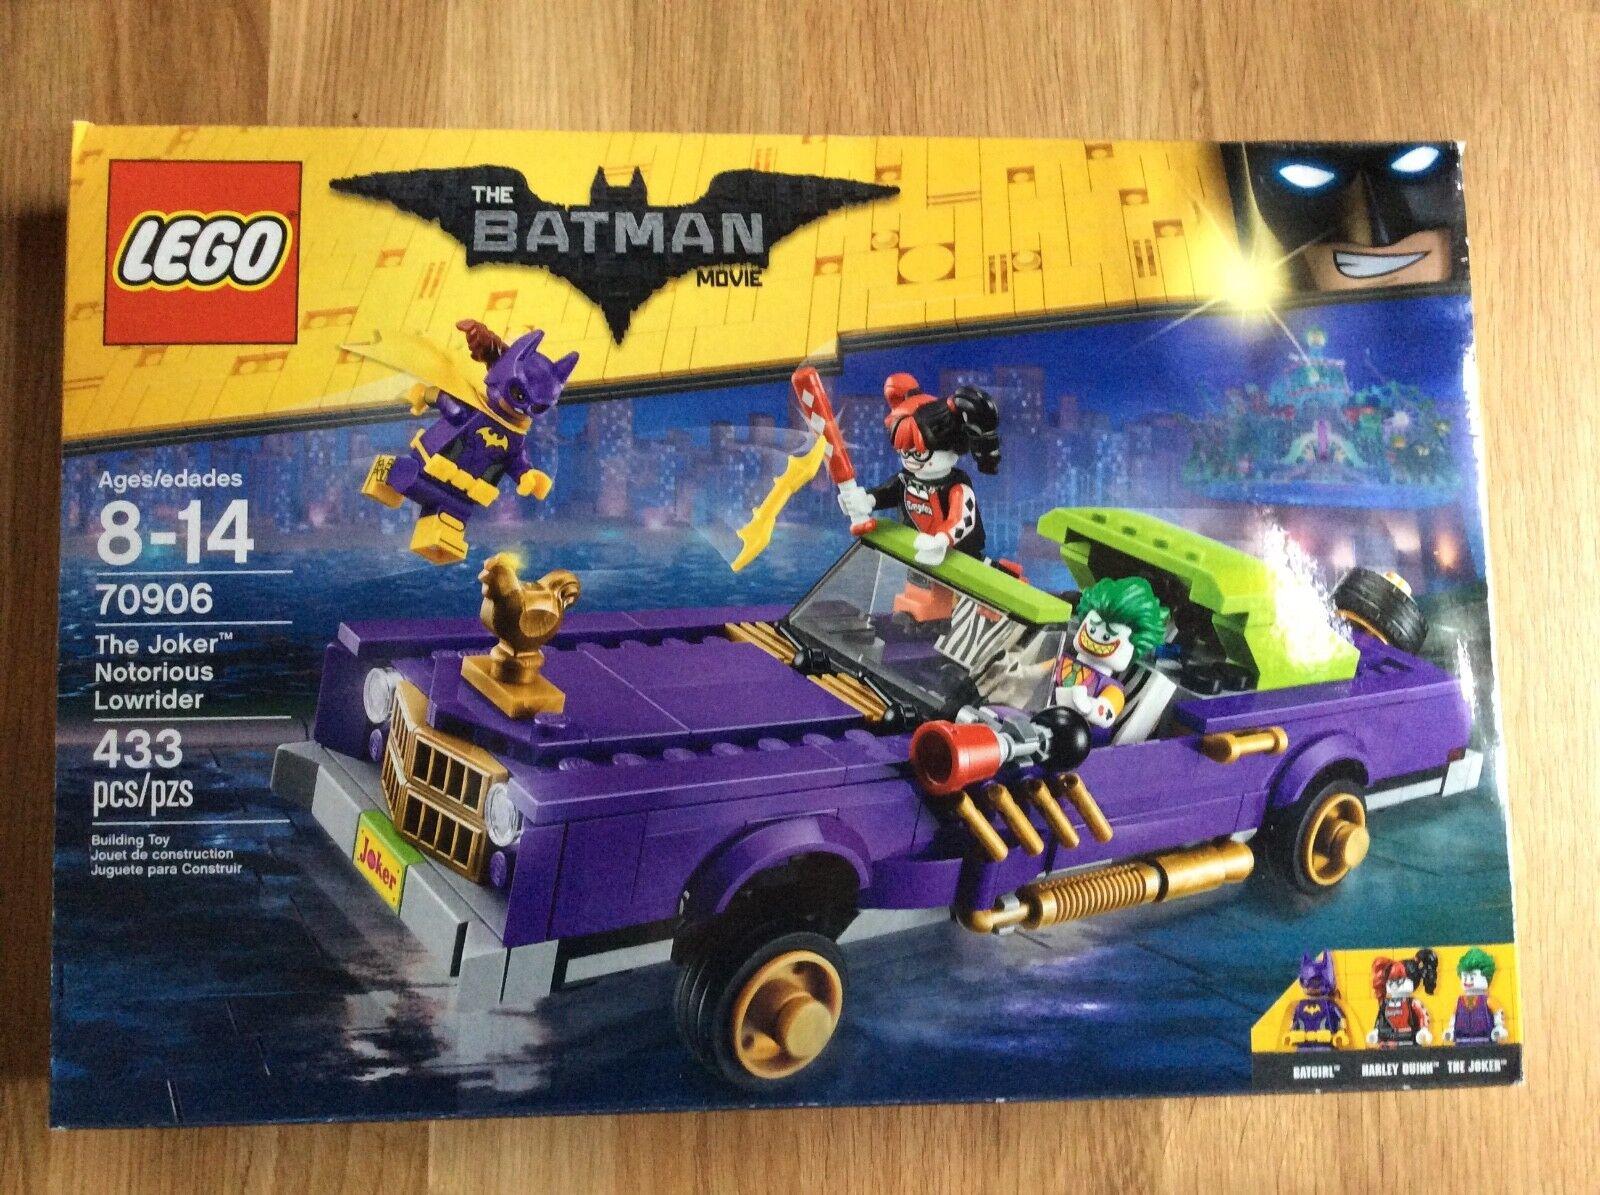 New Lego Batman The Joker Notorious Lowrider Set 70906 in Sealed Damaged Box